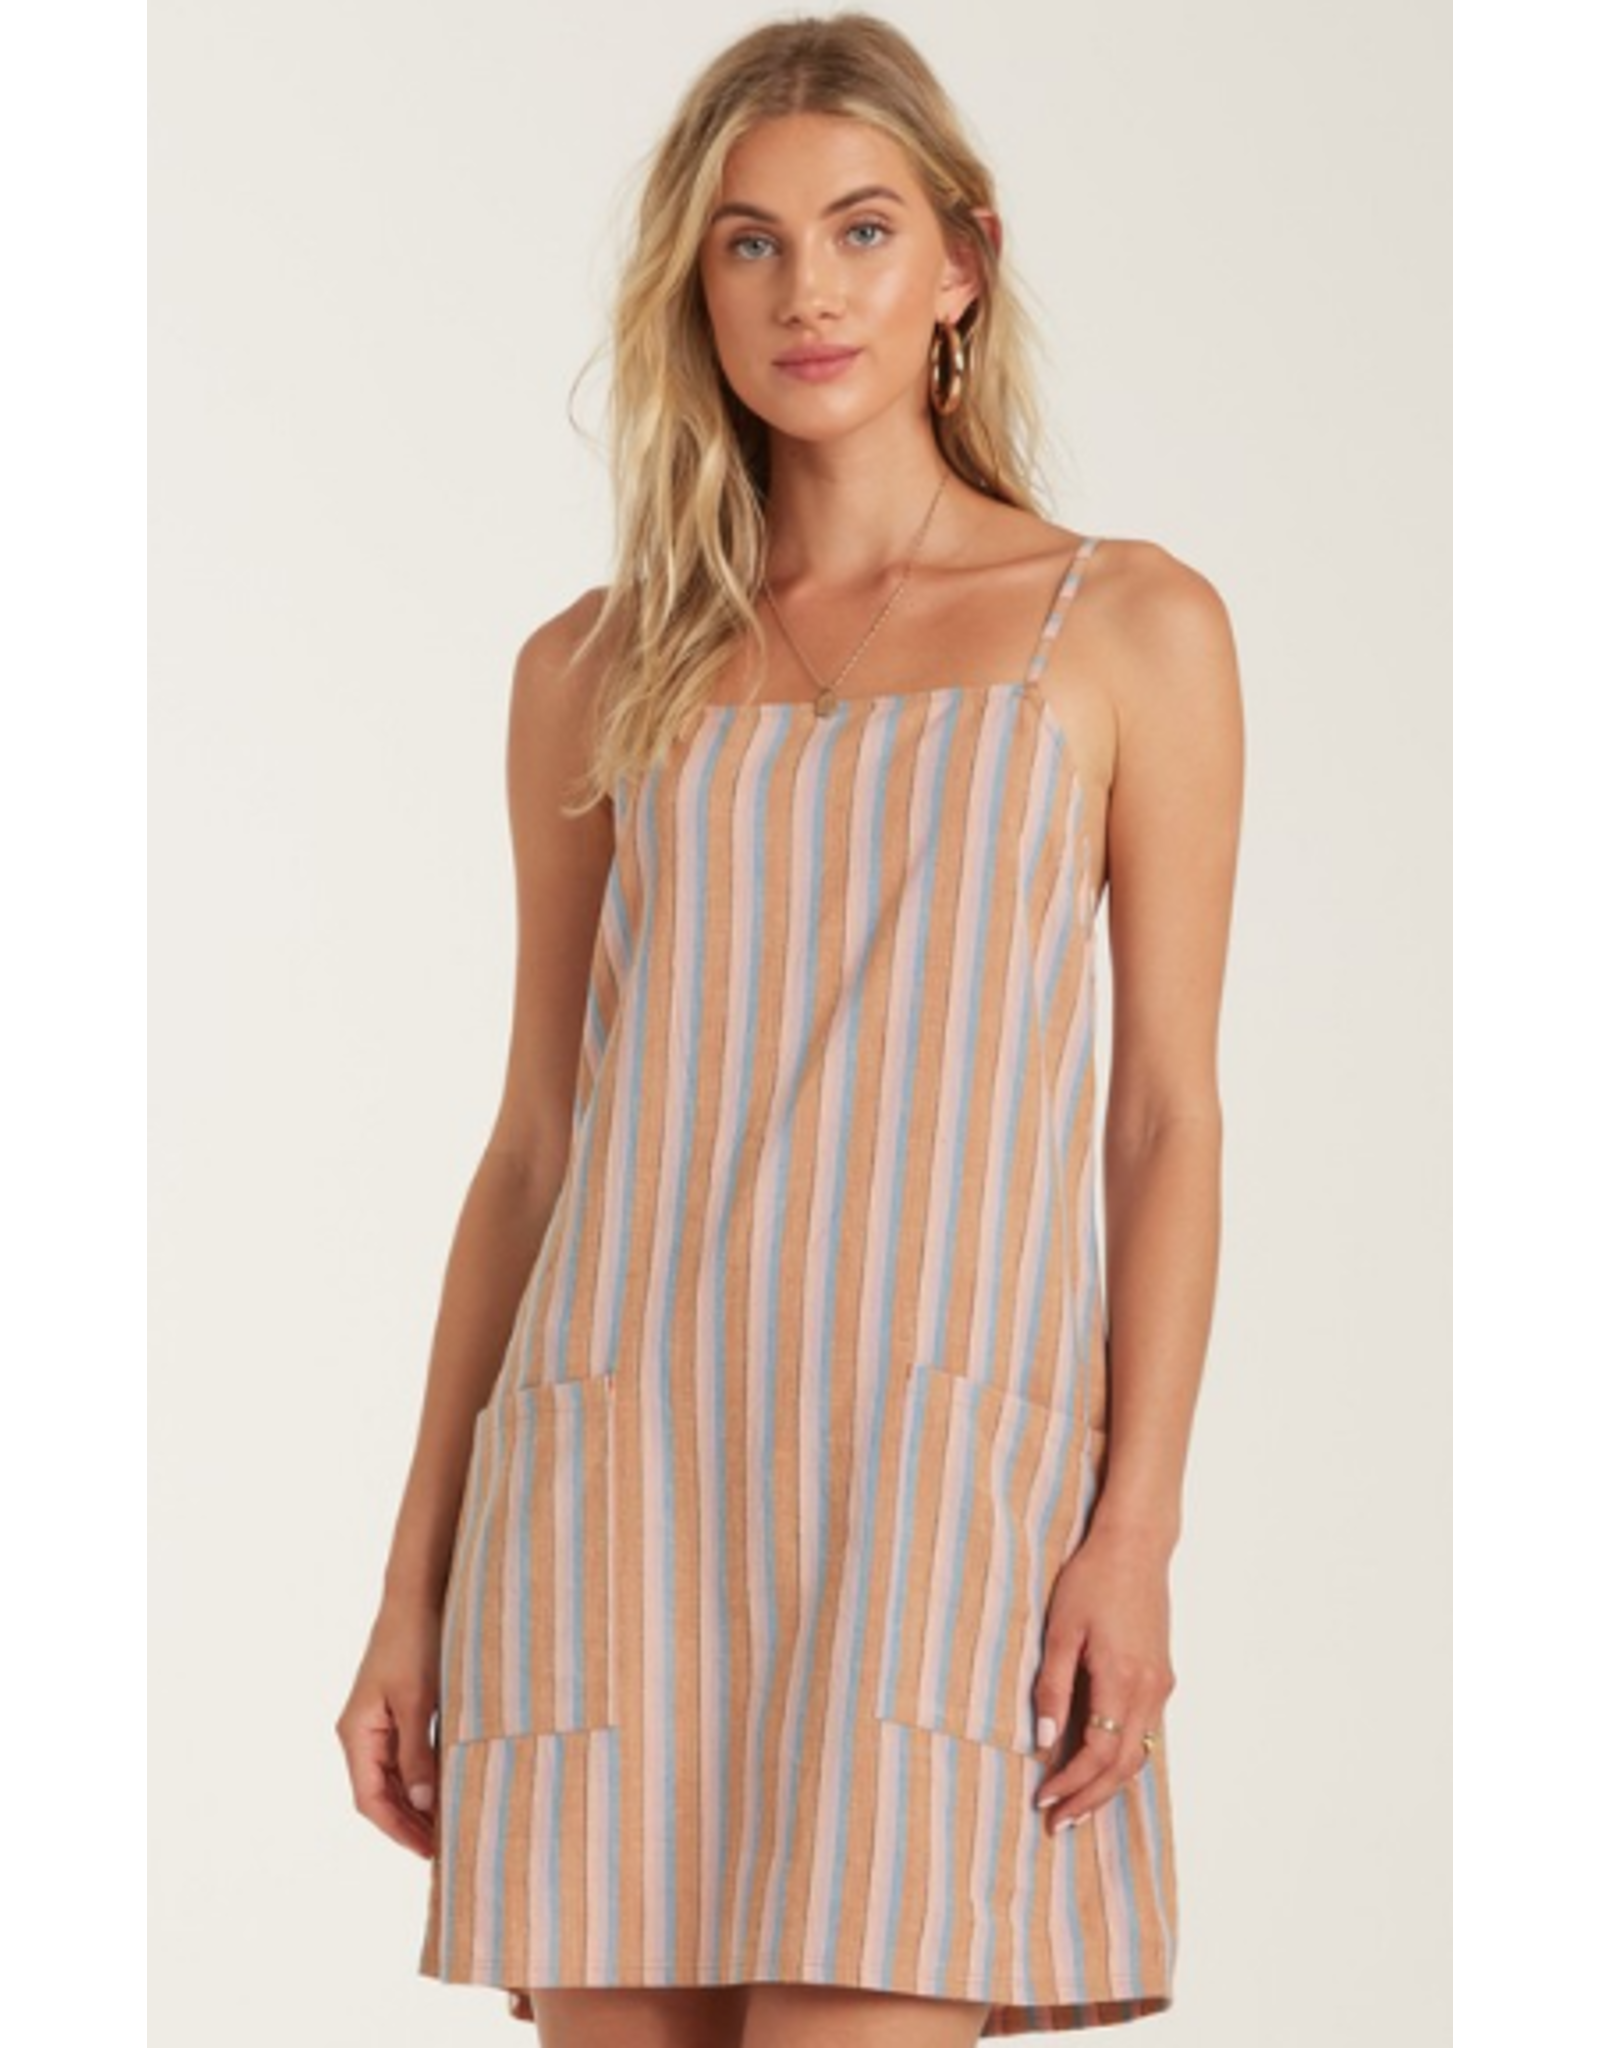 BILLABONG STRAIGHT ROUND DRESS